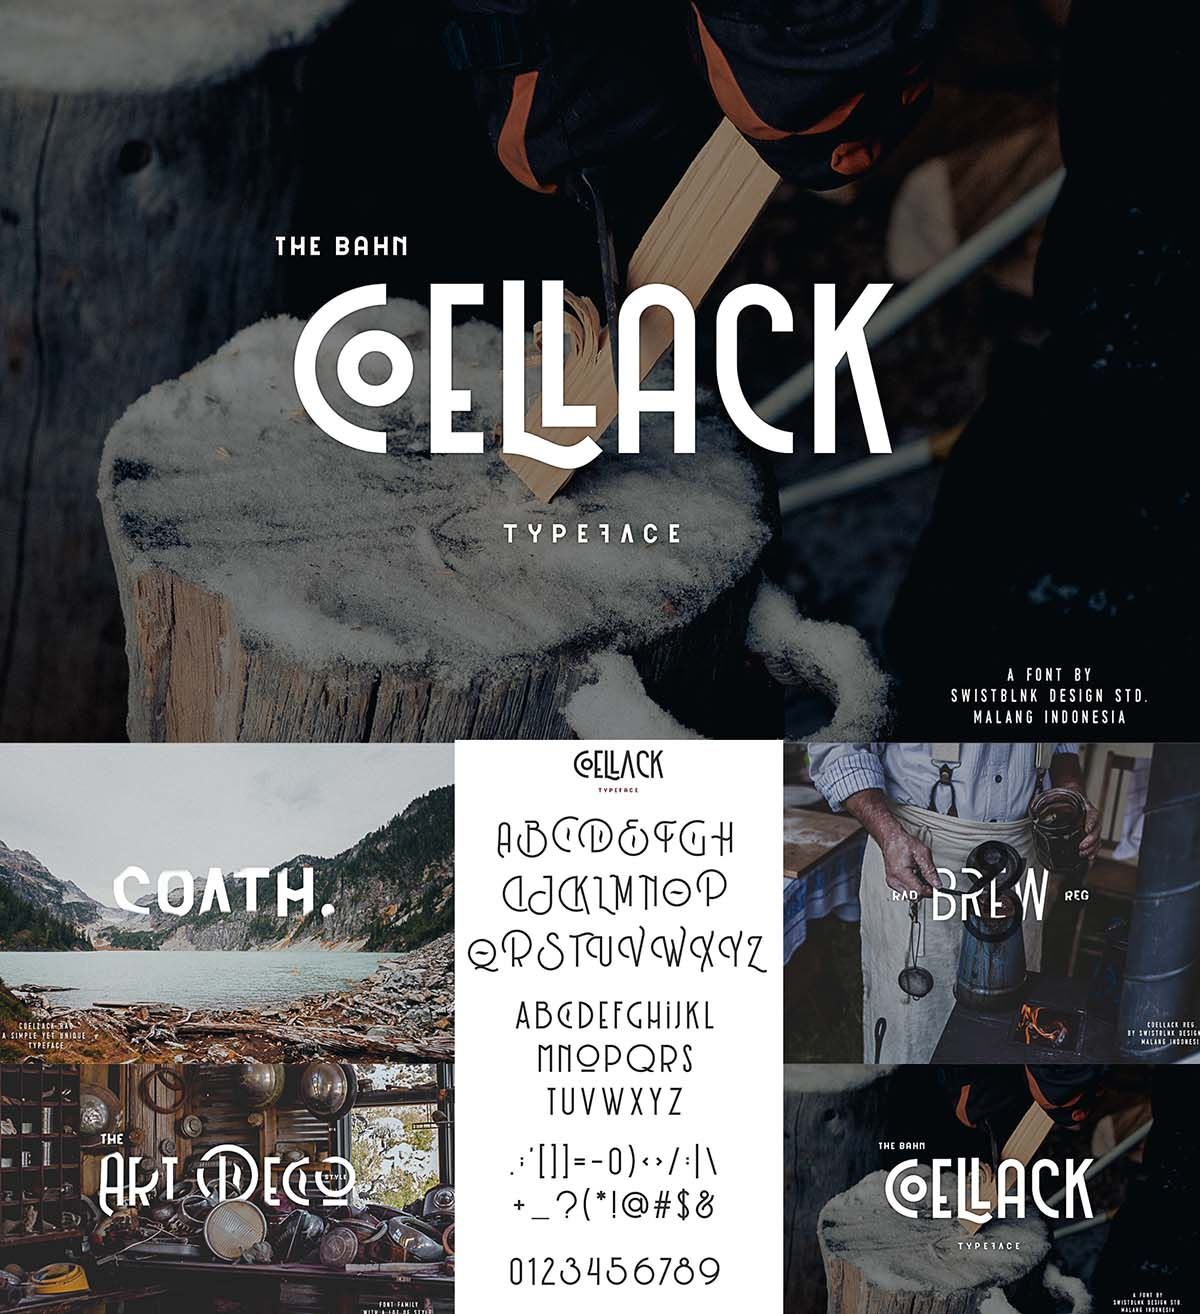 Swistblnk coellack typeface